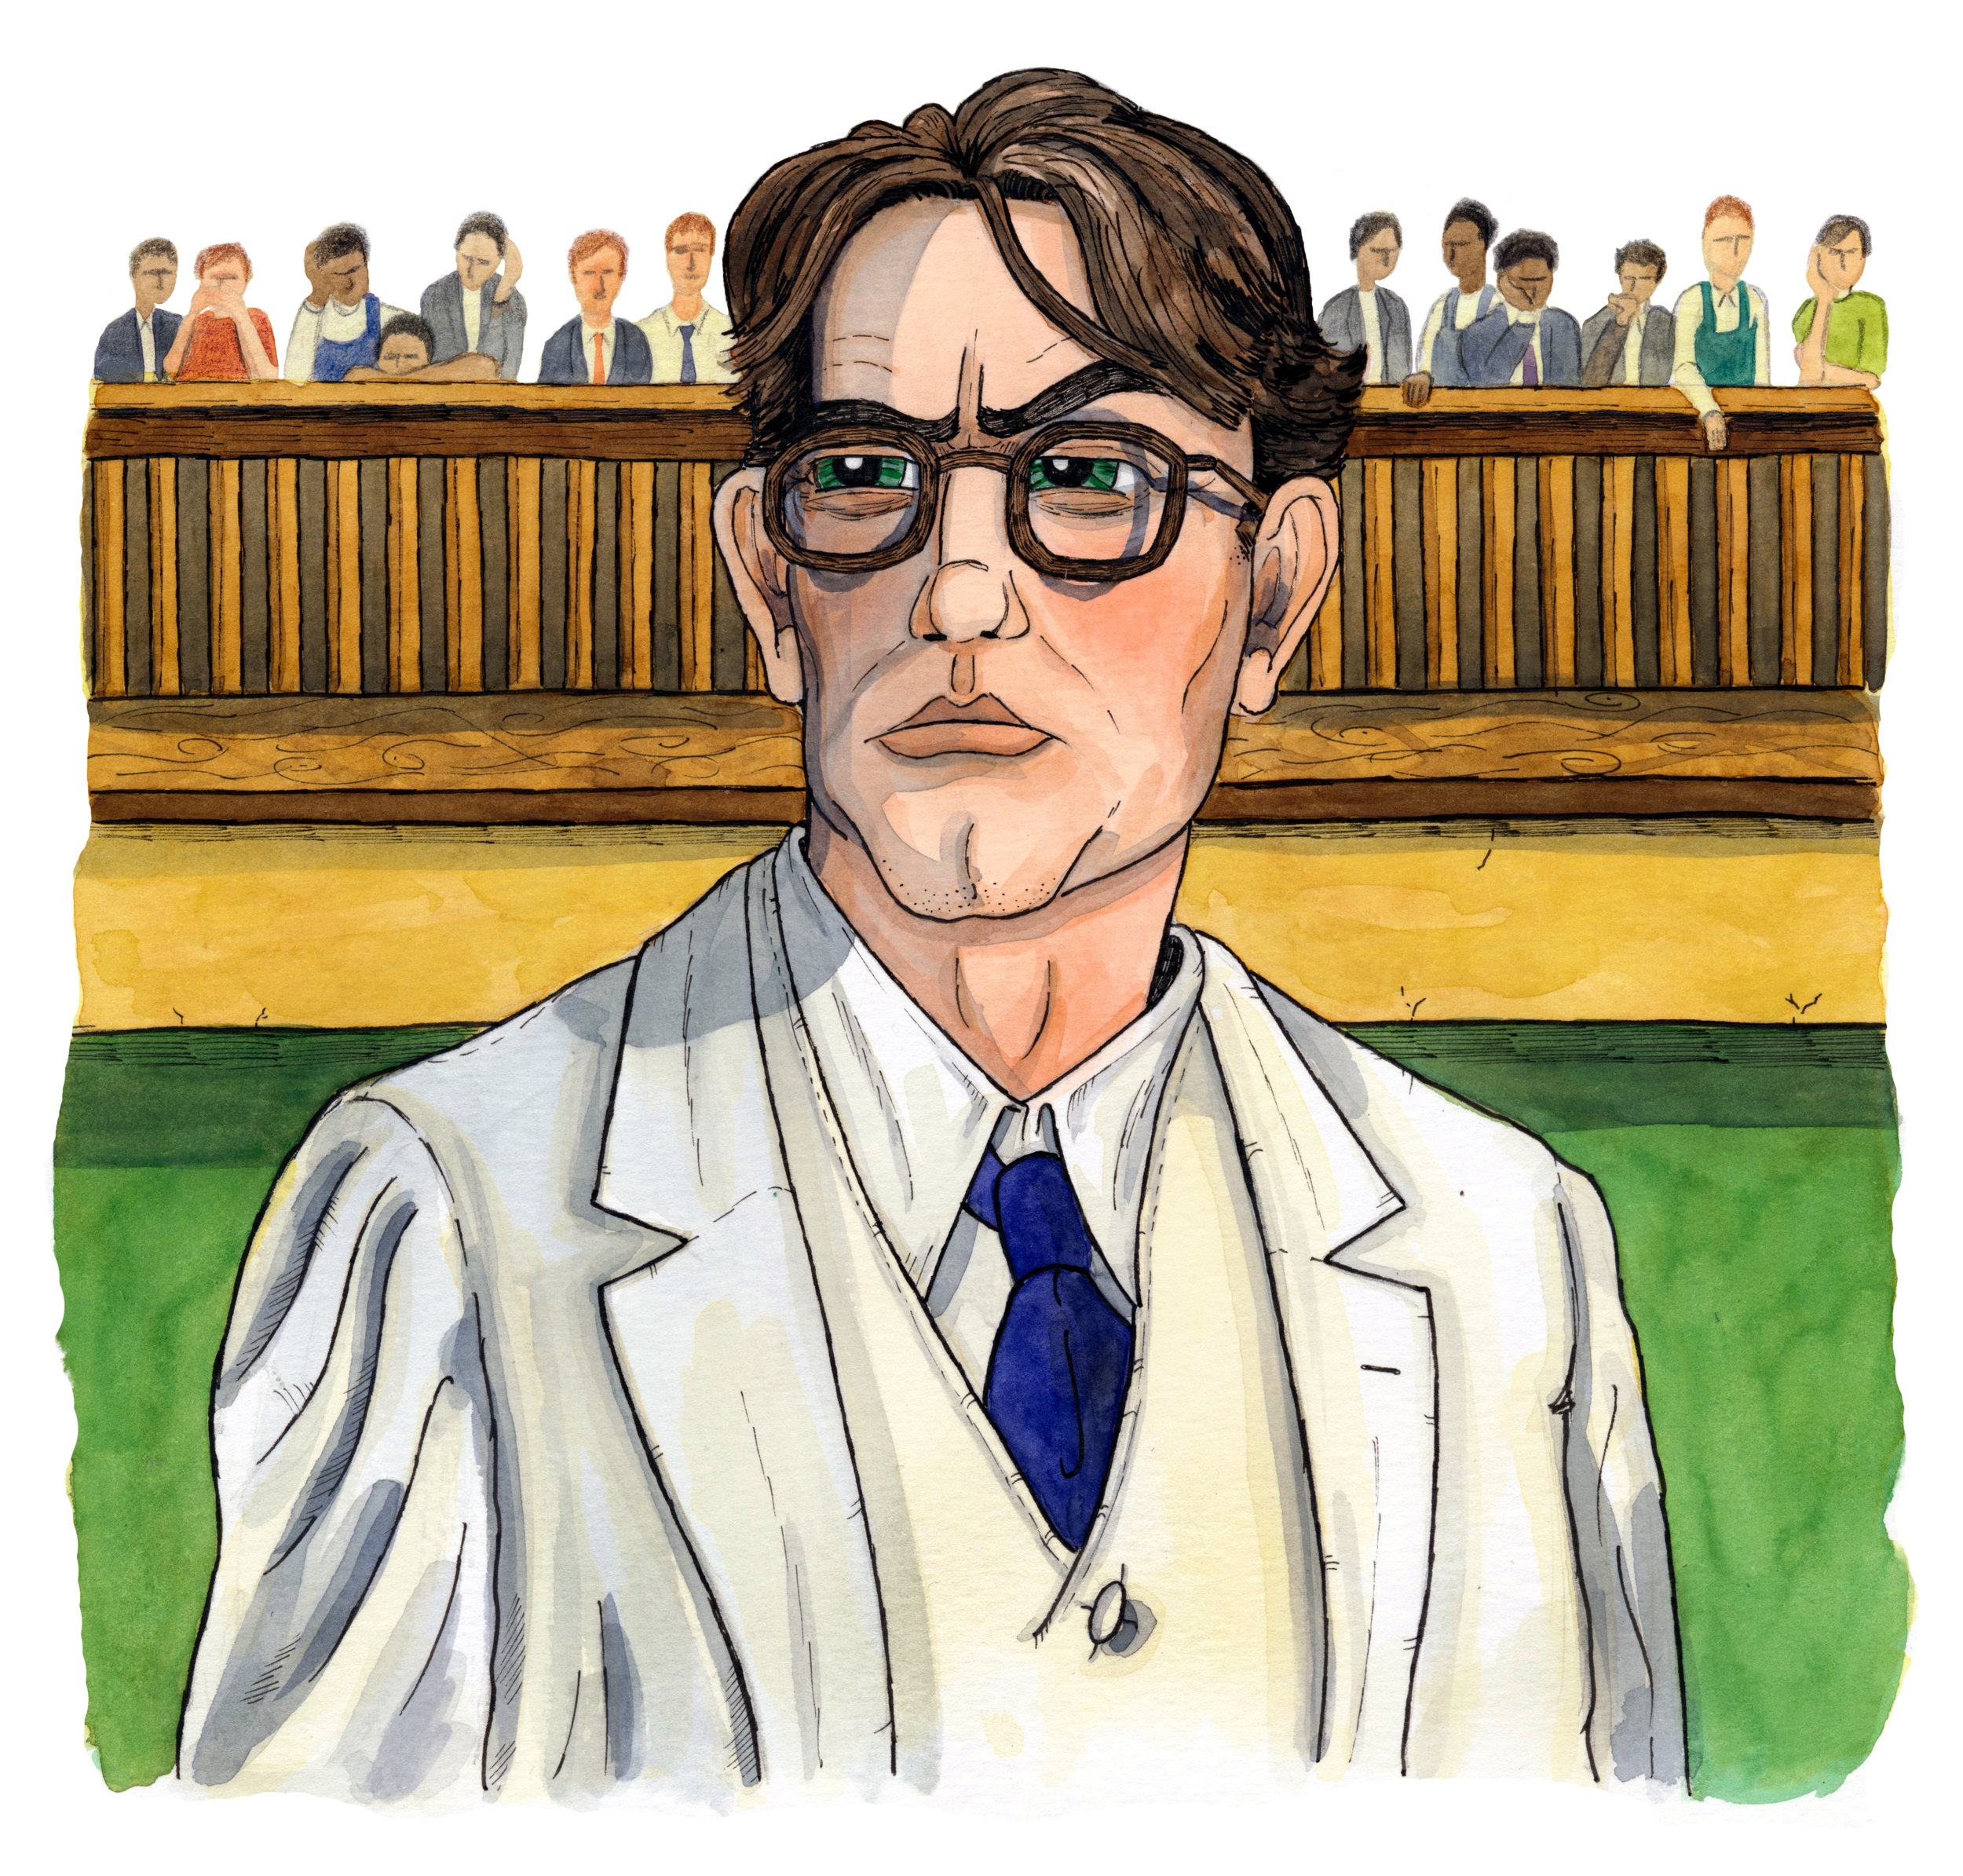 Atticus_Finch.jpeg